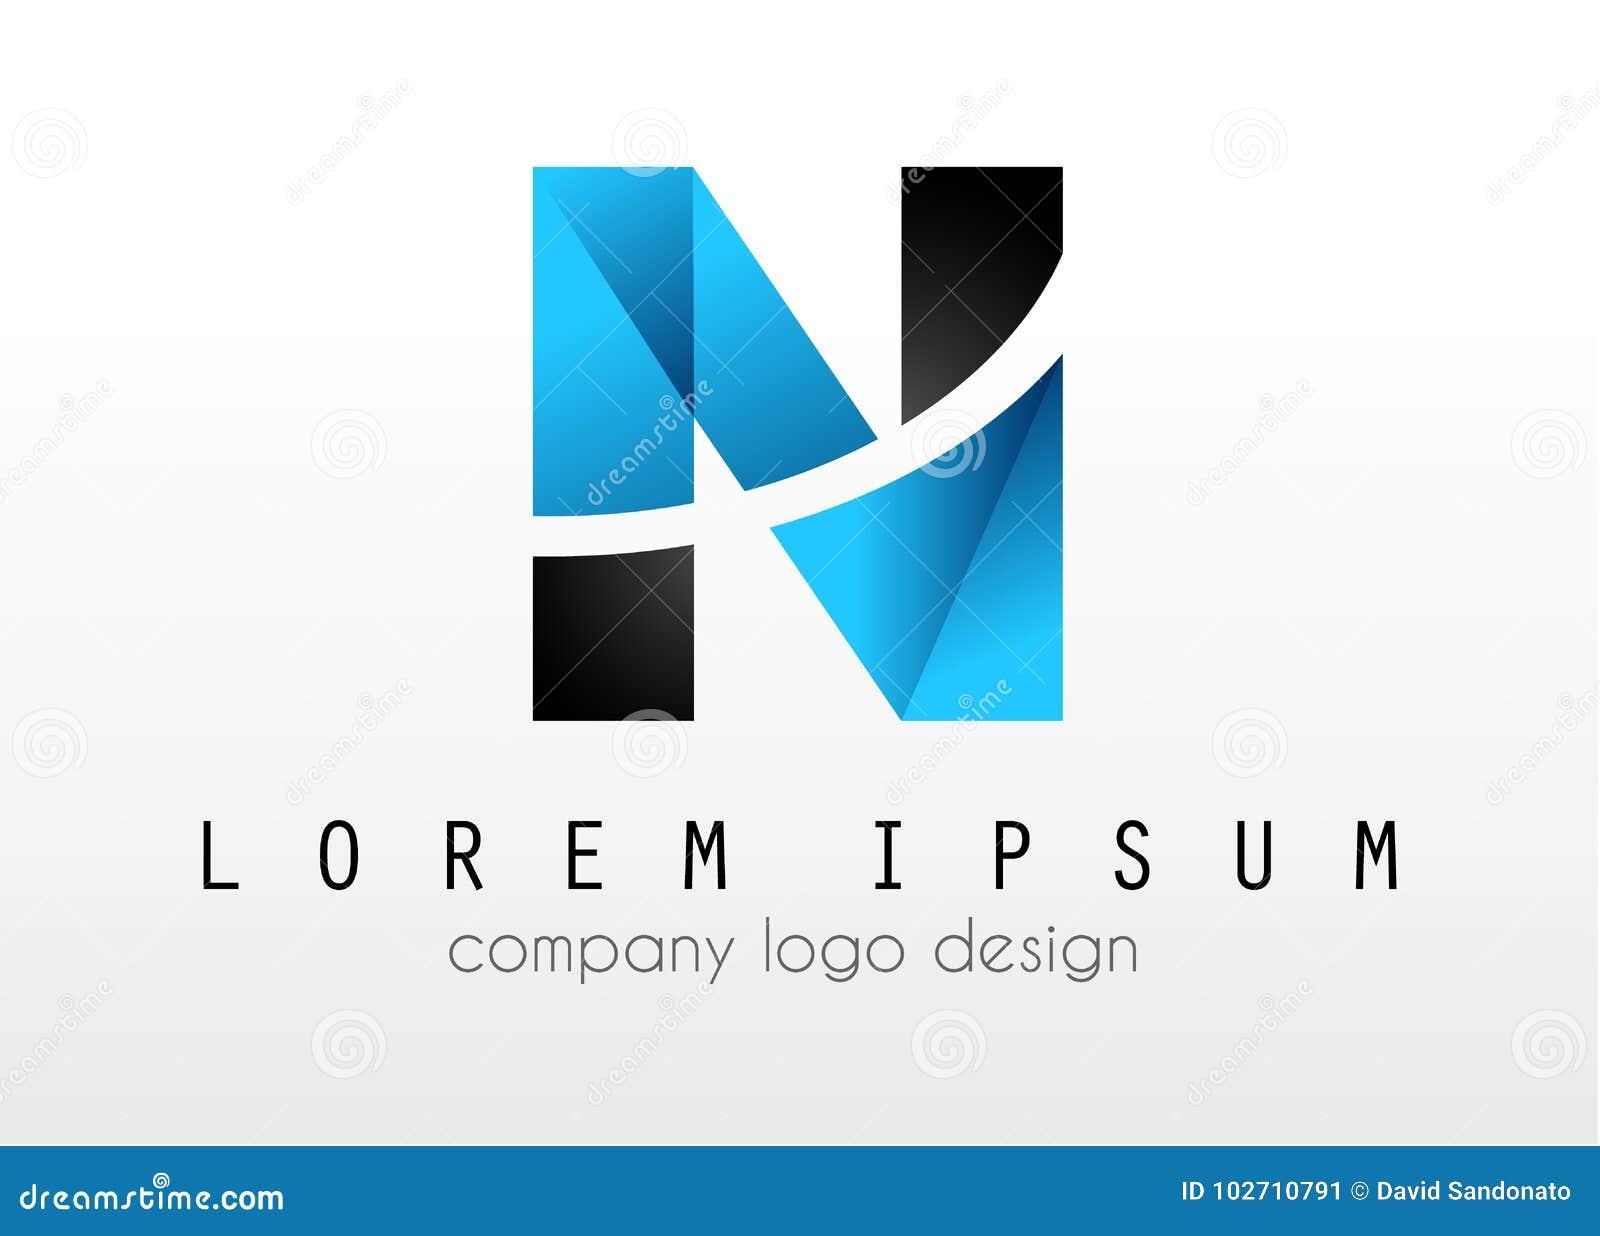 creative logo letter n design for brand identity company profil